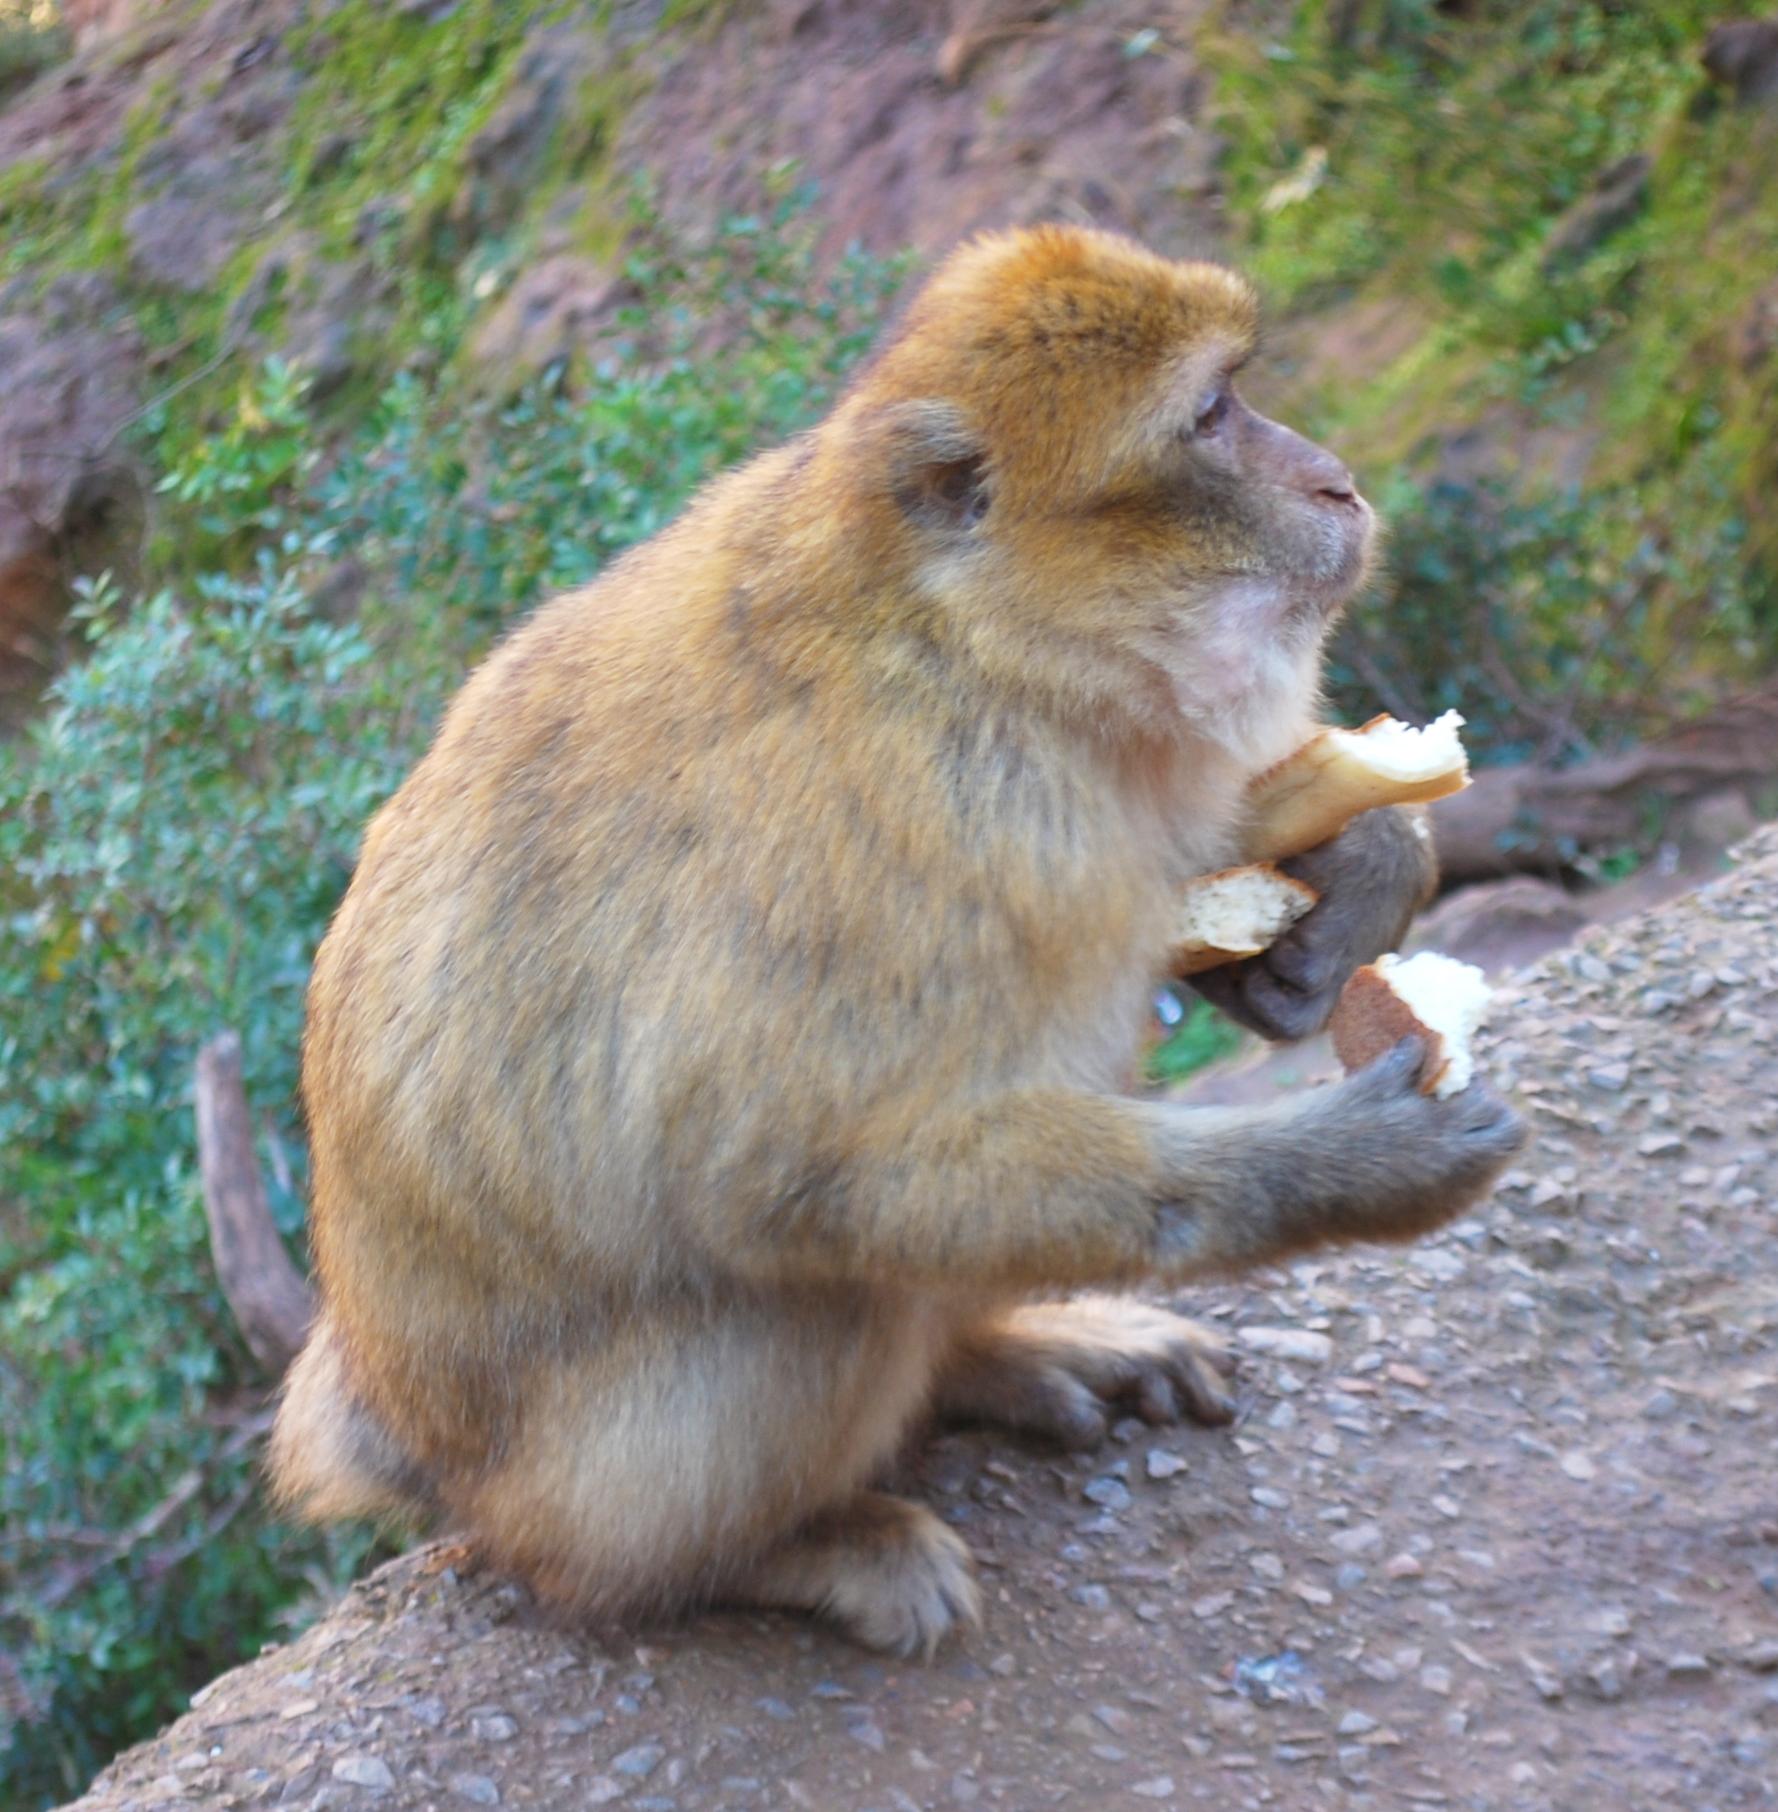 Ouzoud Marokko road trip dag trip marrakech tourist waterval watervallen aap wilde apen lifestyle by linda